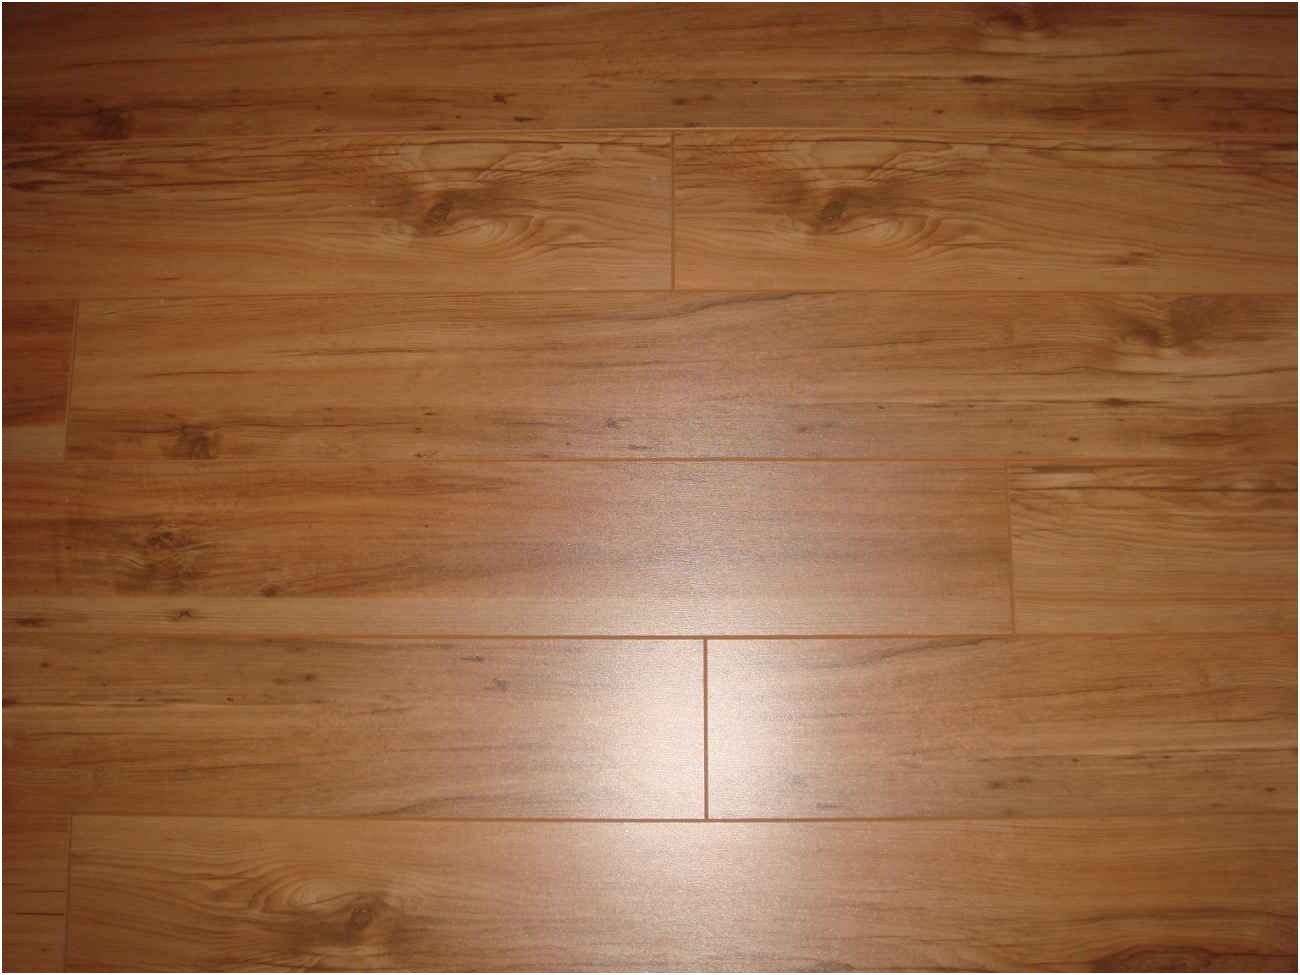 hardwood flooring st louis area of hardwood flooring over ceramic tile stock 3 4 x 4 3 4 solid golden with regard to hardwood flooring over ceramic tile galerie tile that looks like hardwood floors elegant i pinimg 736x